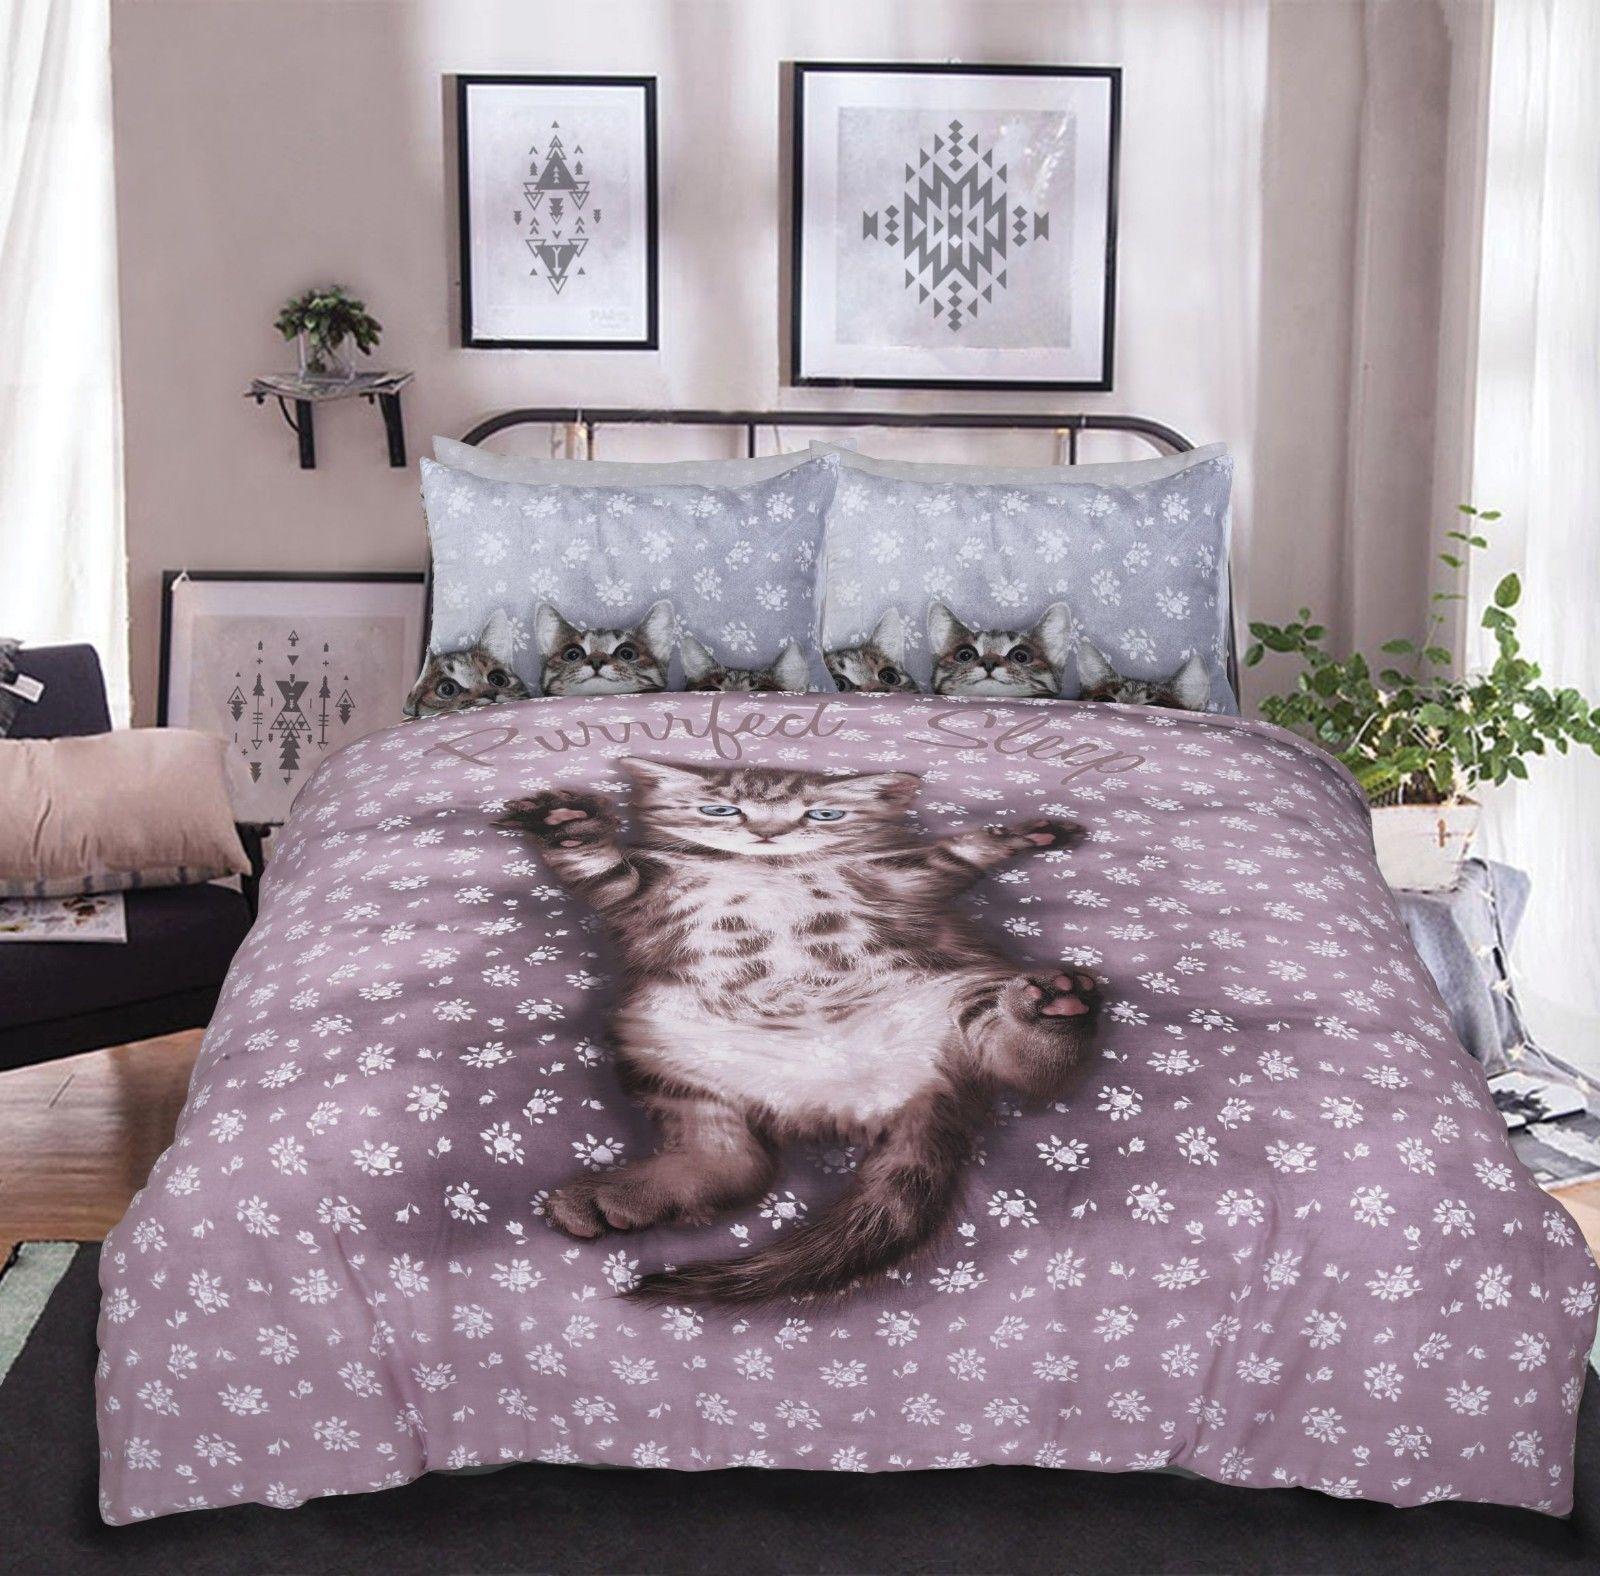 3D Cute Kitten Single Duvet Set Quilt Cover with Pillow Case Bedding Bed vmk